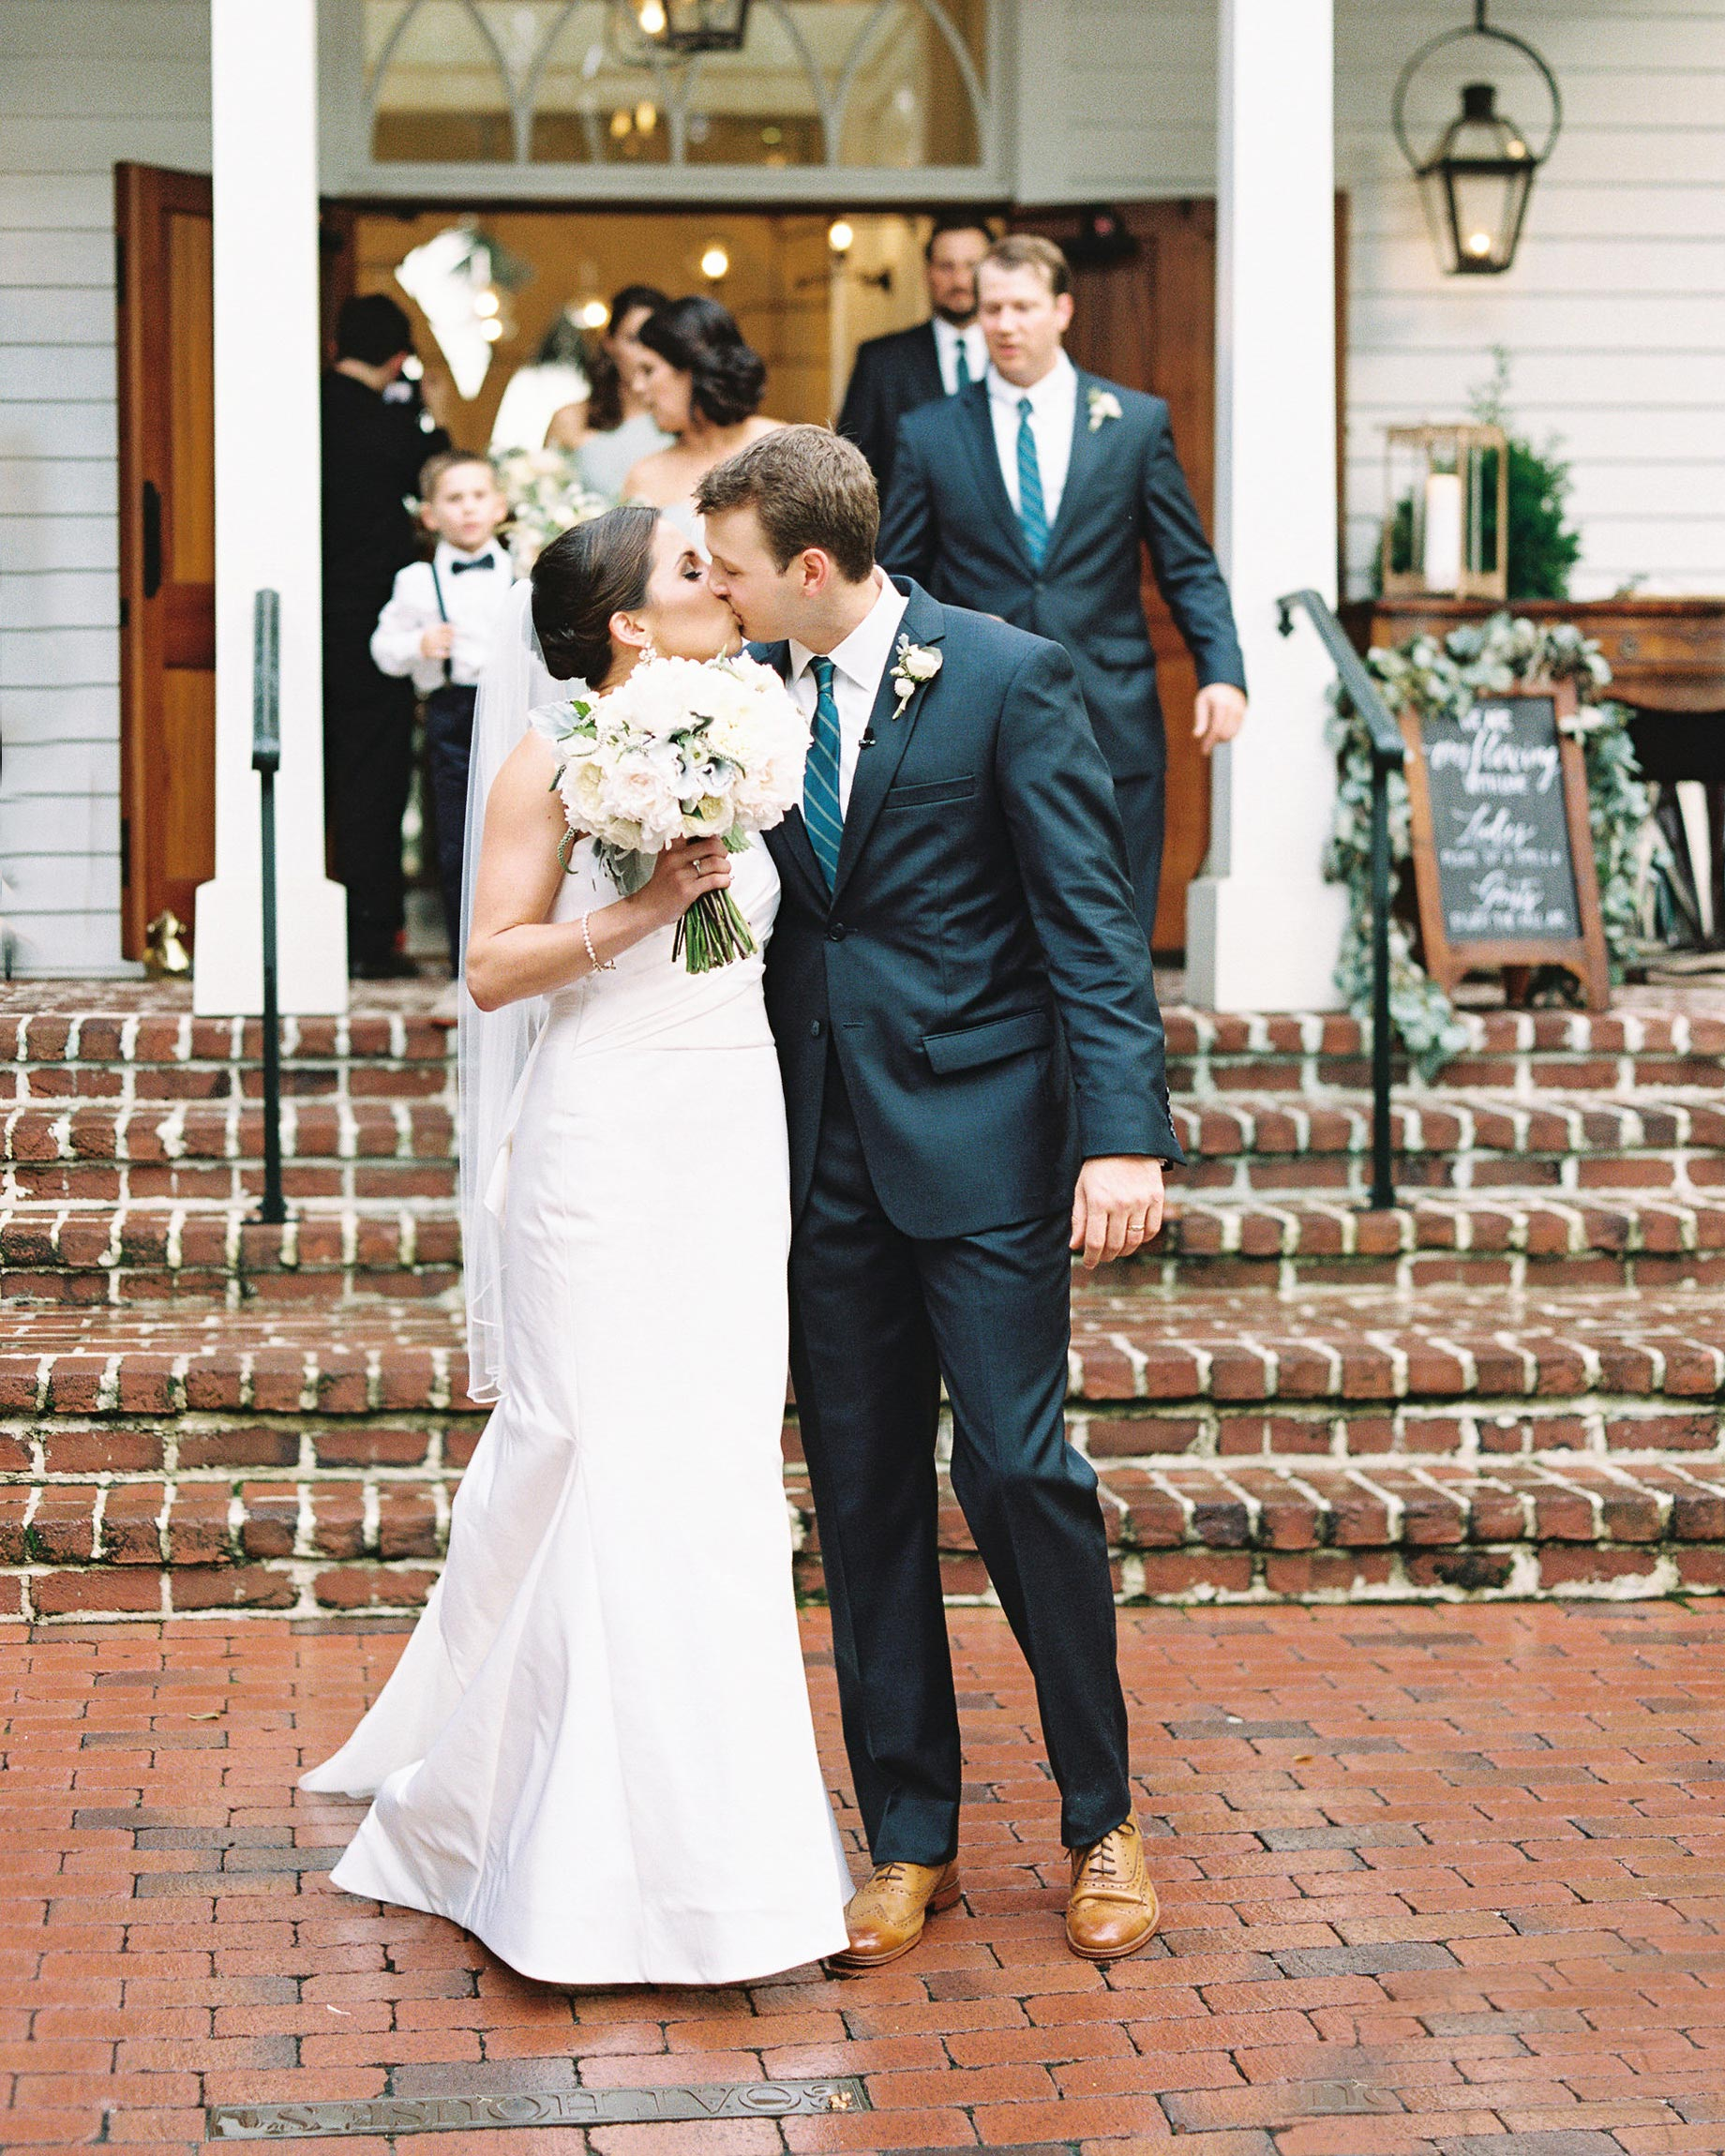 taylor-john-wedding-couple-kiss-154-s113035-0616.jpg